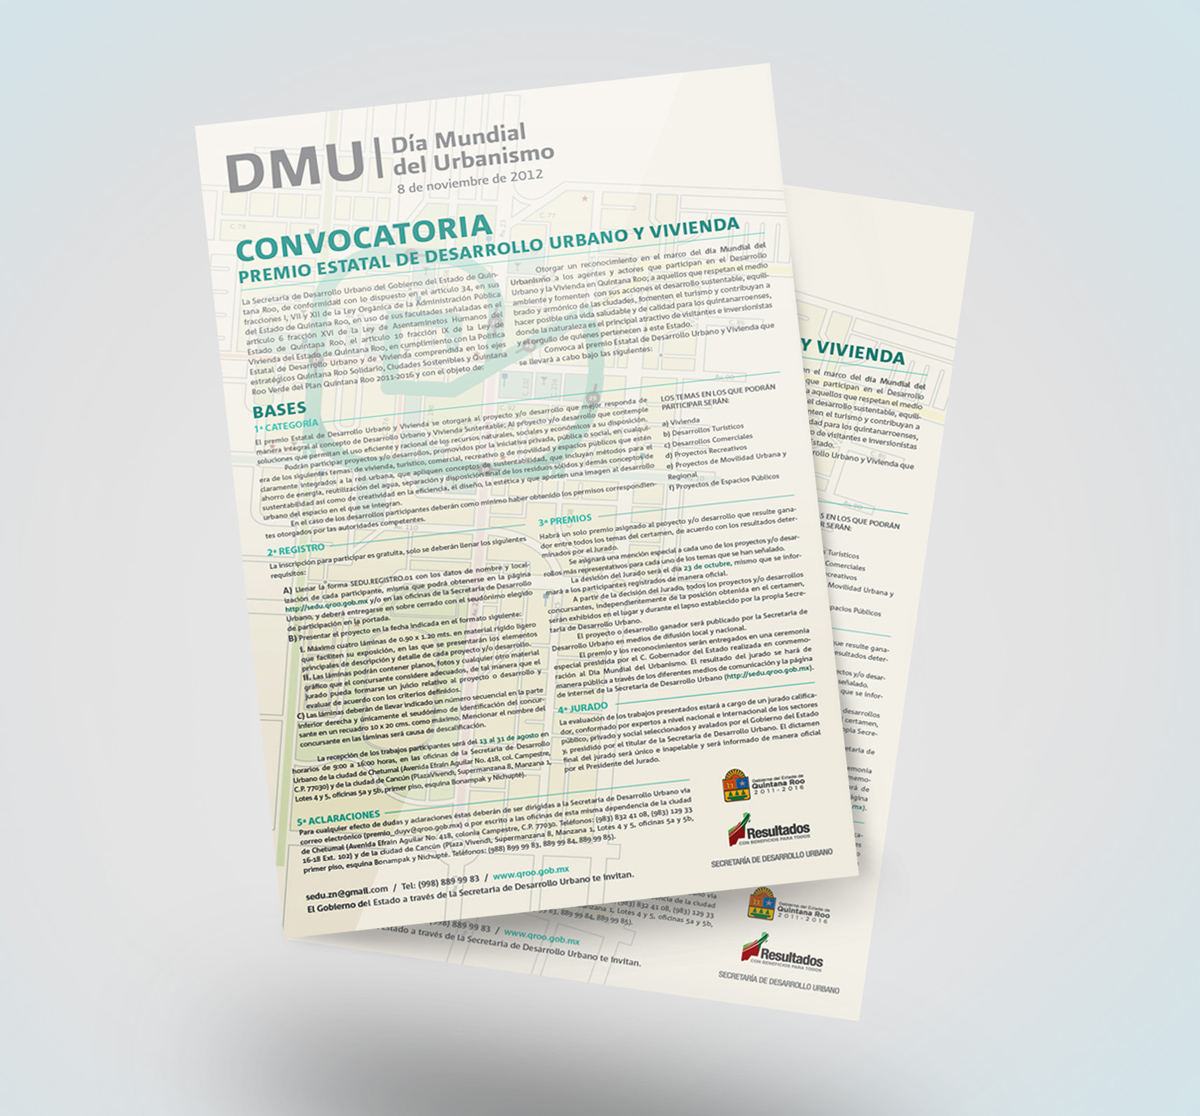 DMU - Convocatoria